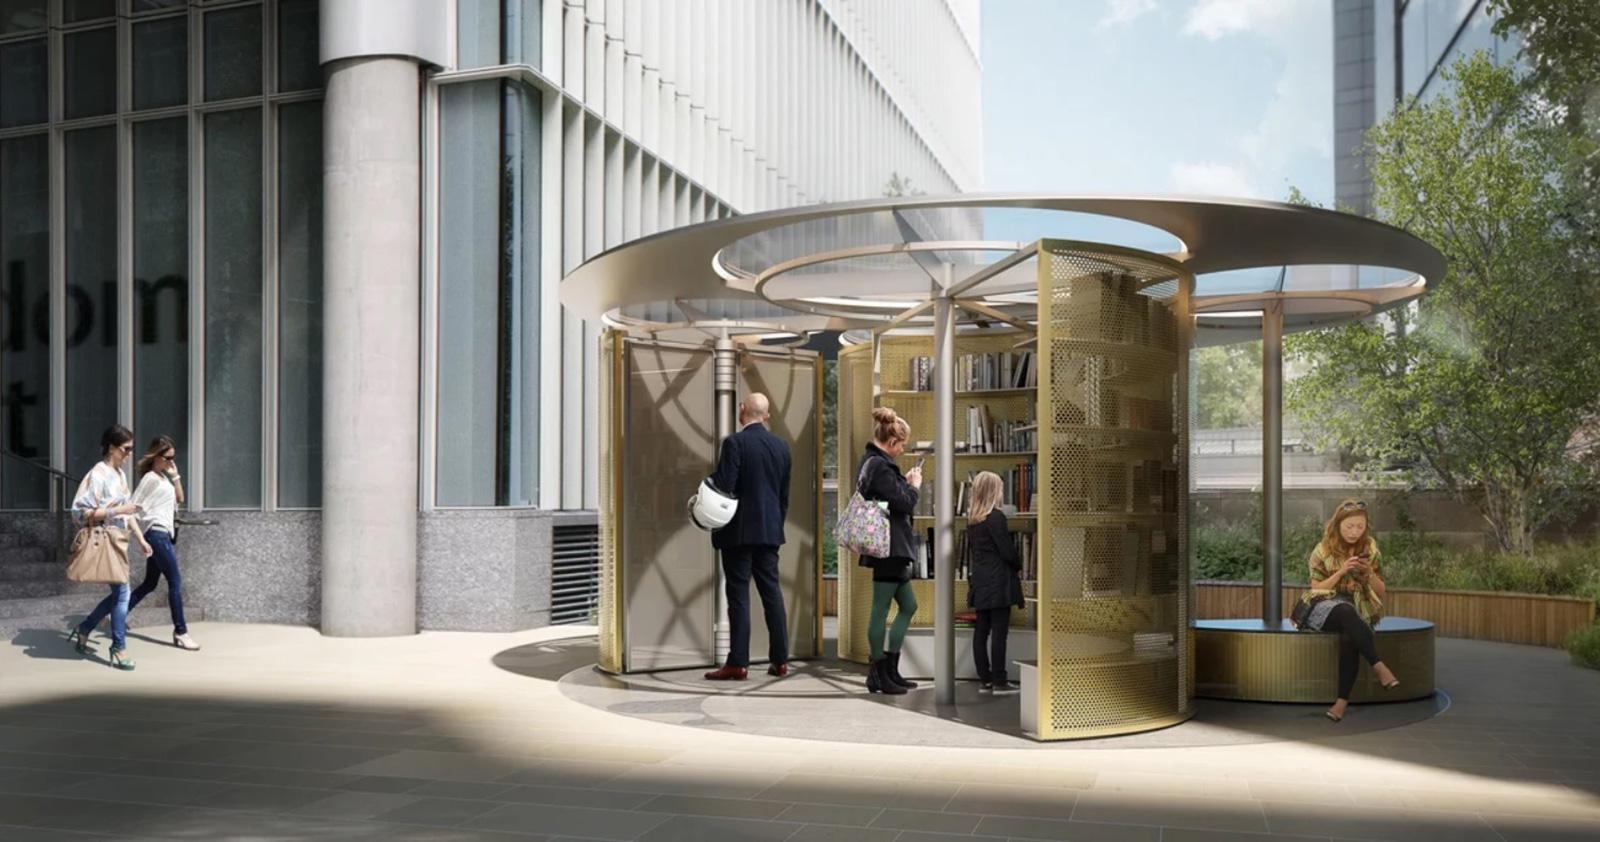 Snohetta book pavilion at London design festival 2018